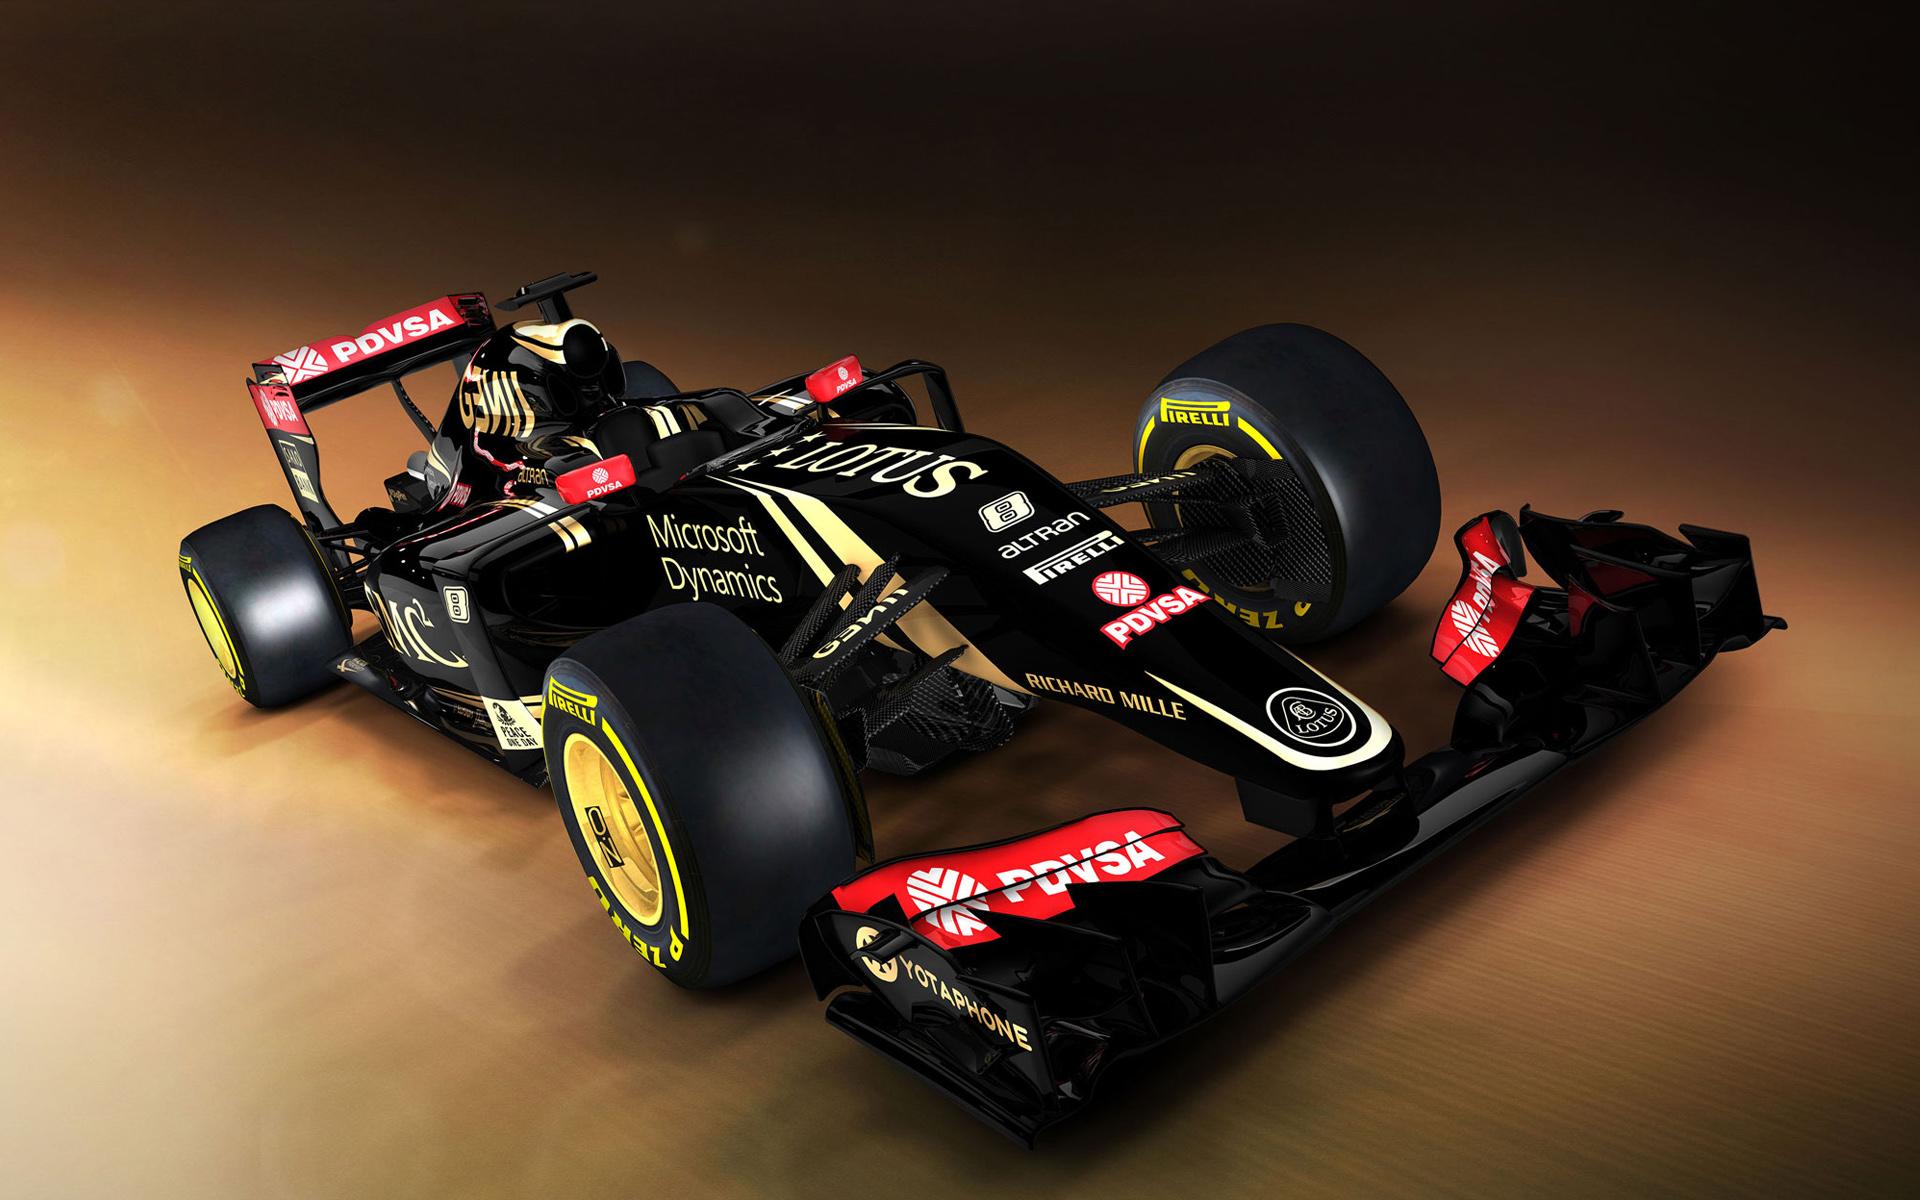 2015 Lotus E23 F1 2 Wallpaper   HD Car Wallpapers   ID #5092